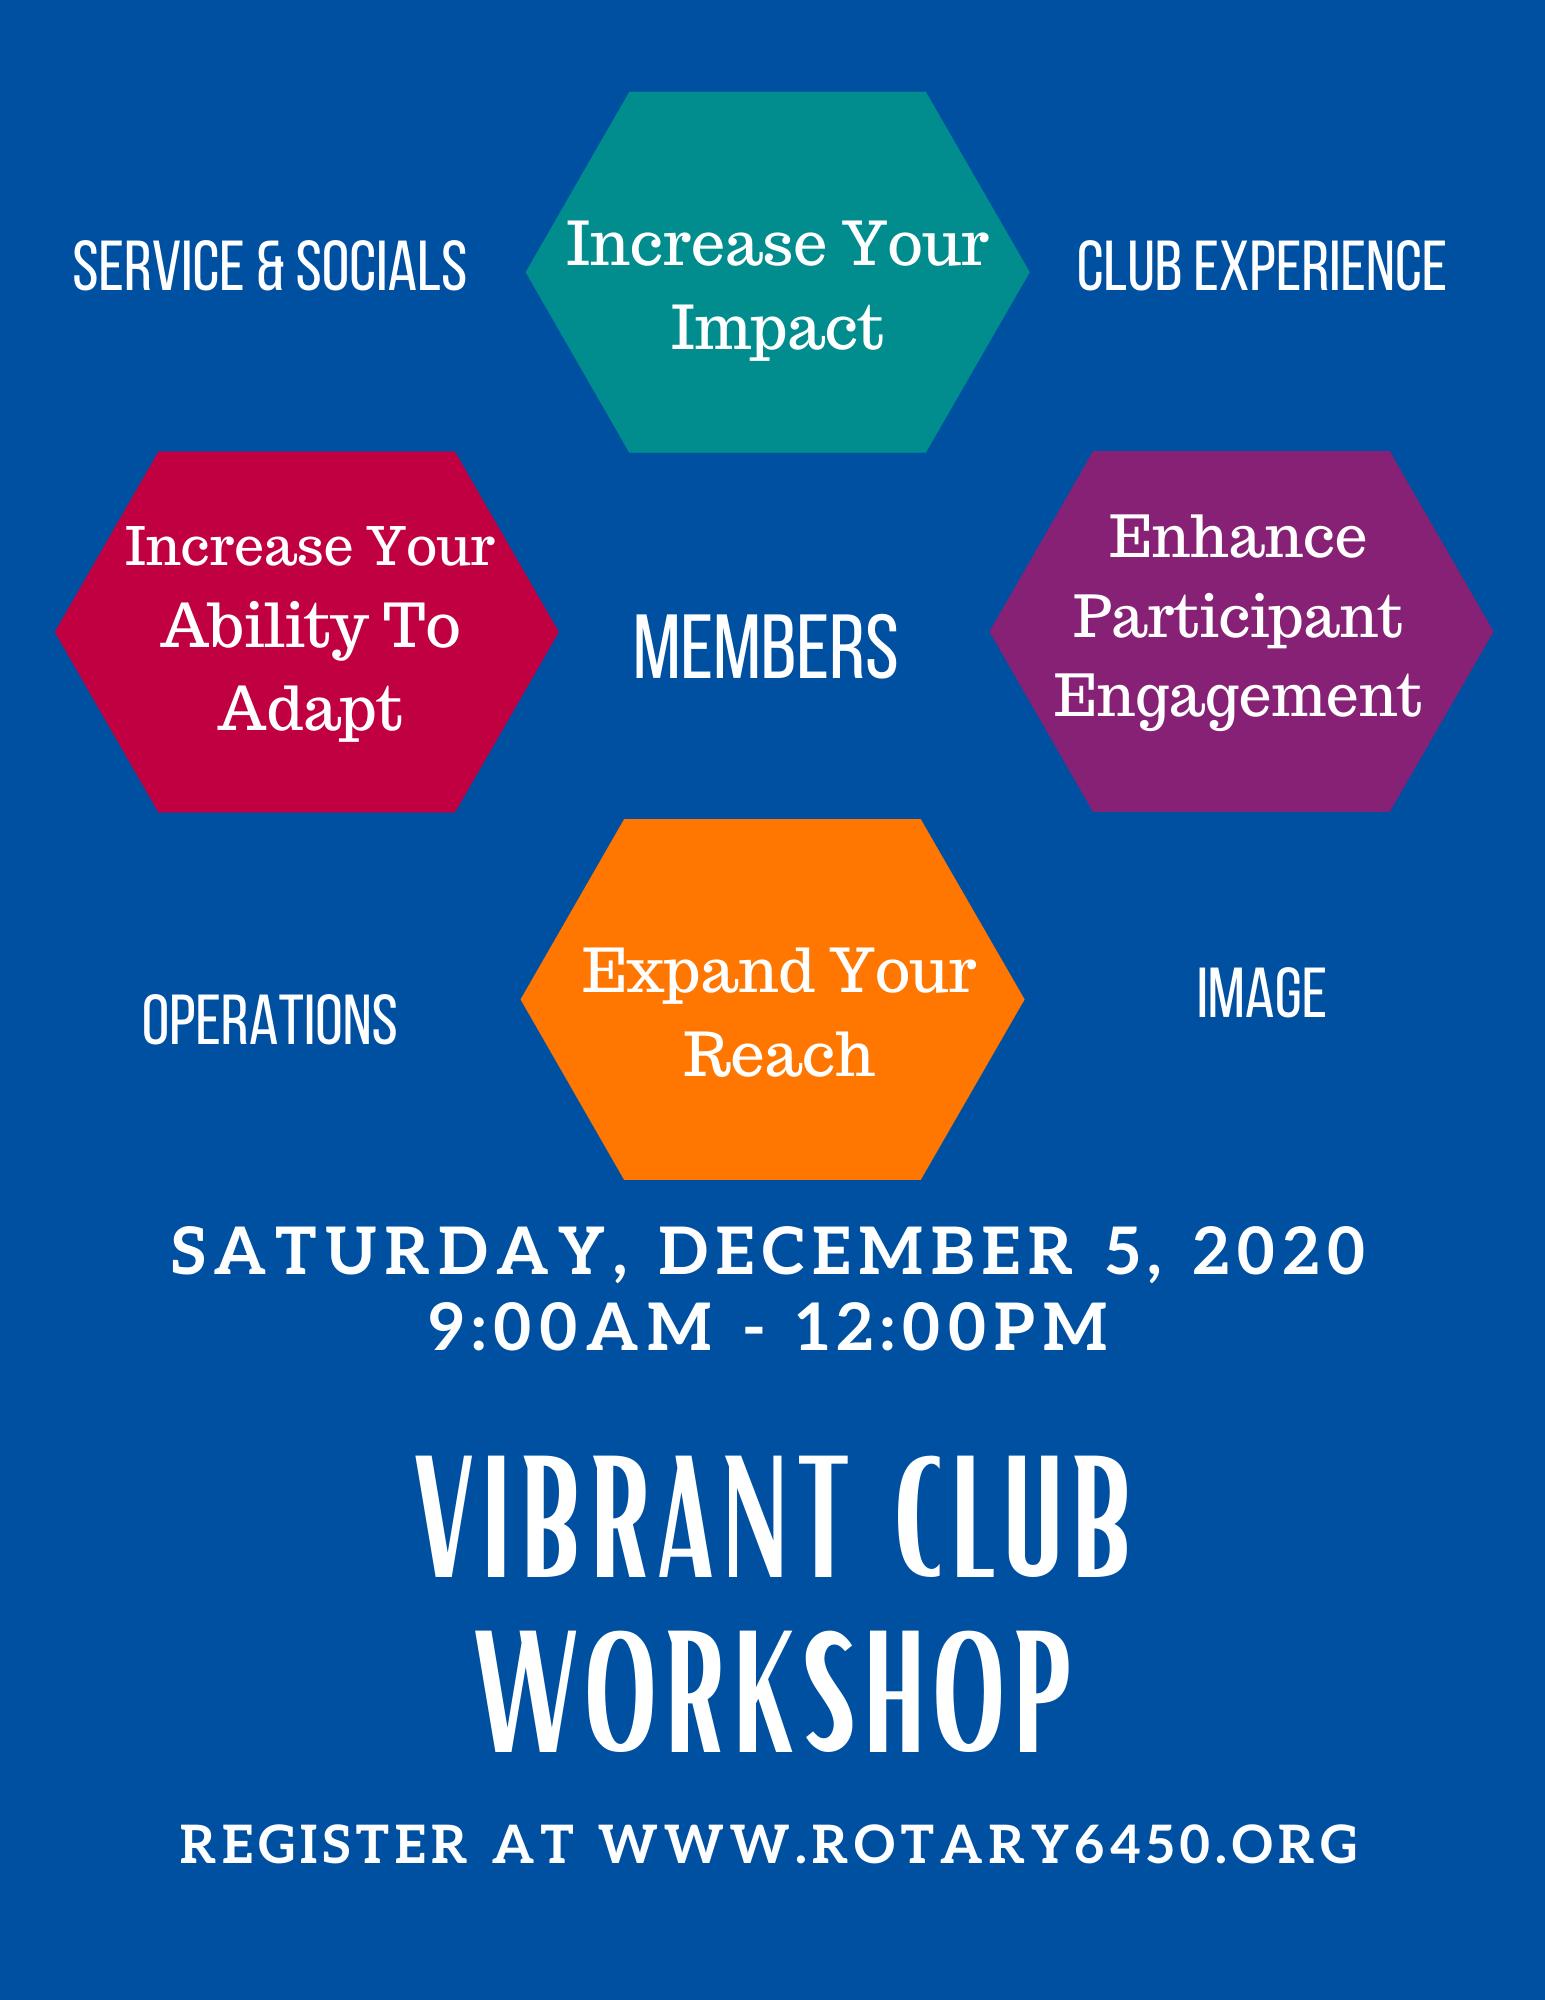 Vibrant Club